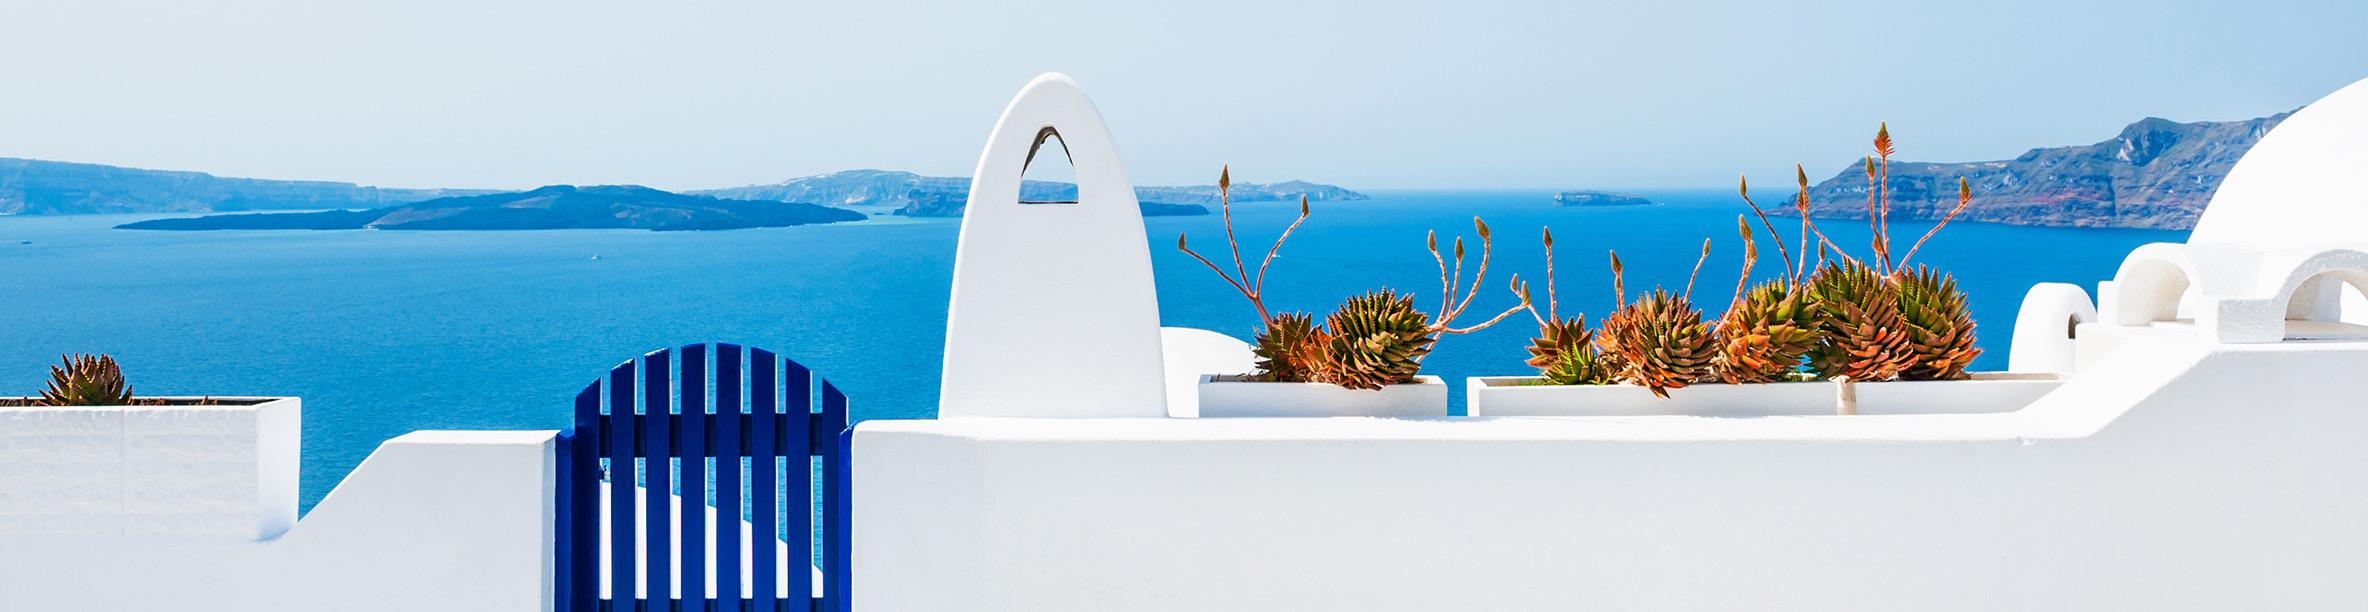 Griechenland Santorini Architektur Panorama